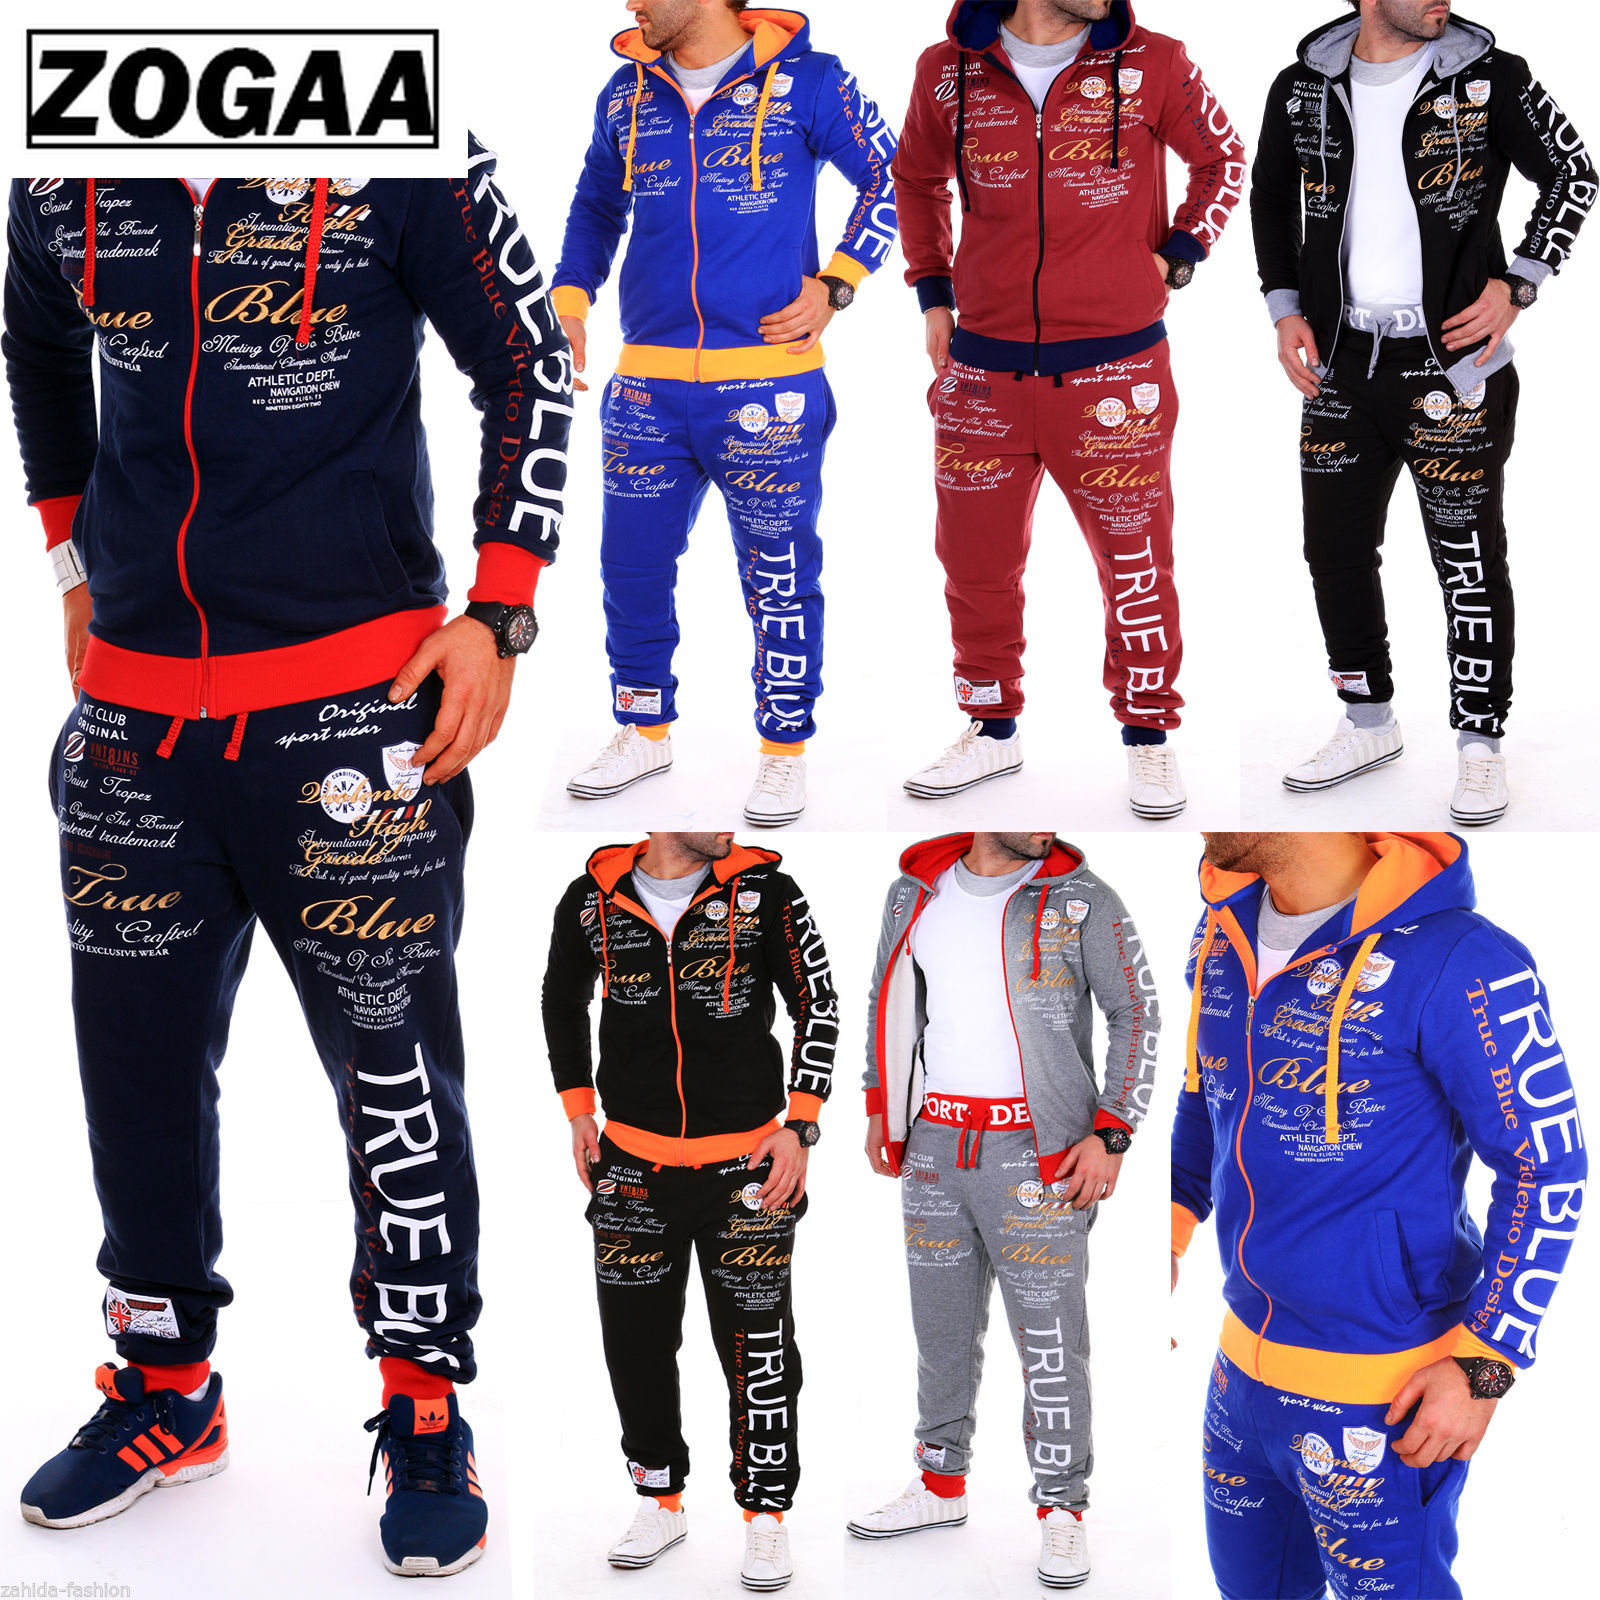 ZOGAA New Multicolor Men's Sports Suit Casual Comfort Sports Suit Men's Sports Jacket Ropa Hombre 2019 Sweat Suits Men Zipper